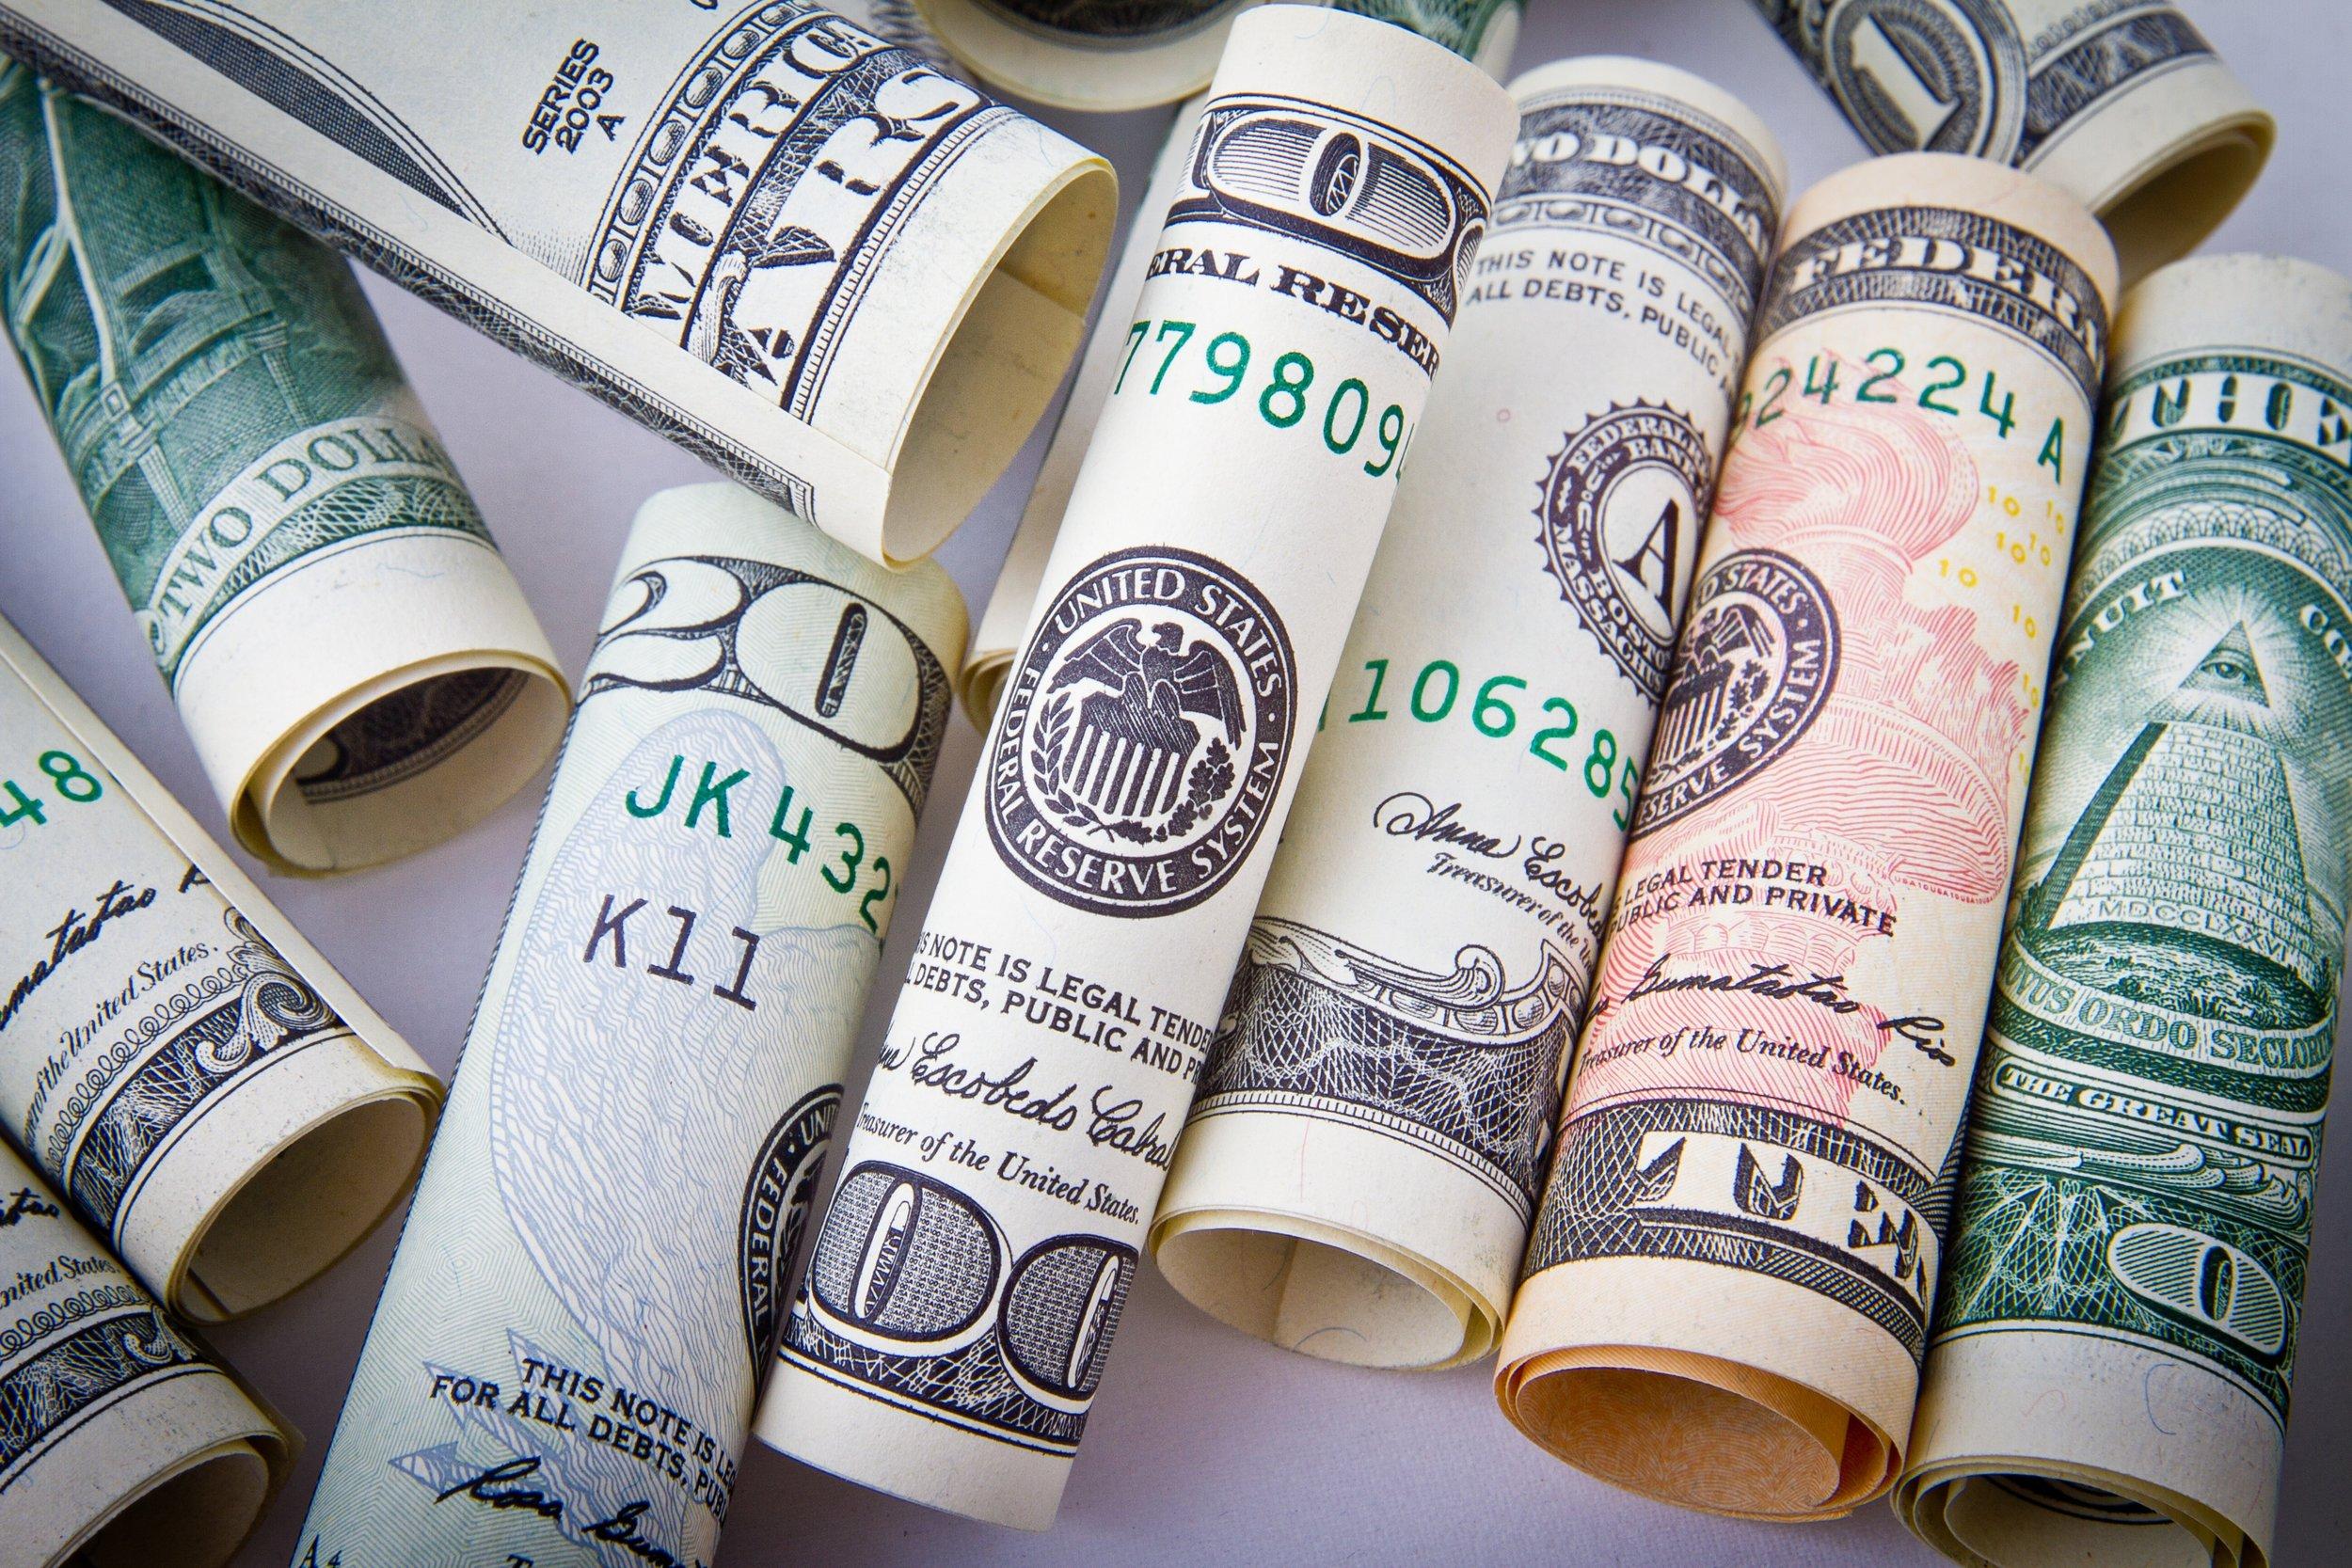 abundance-bank-notes-bill-164527.jpg